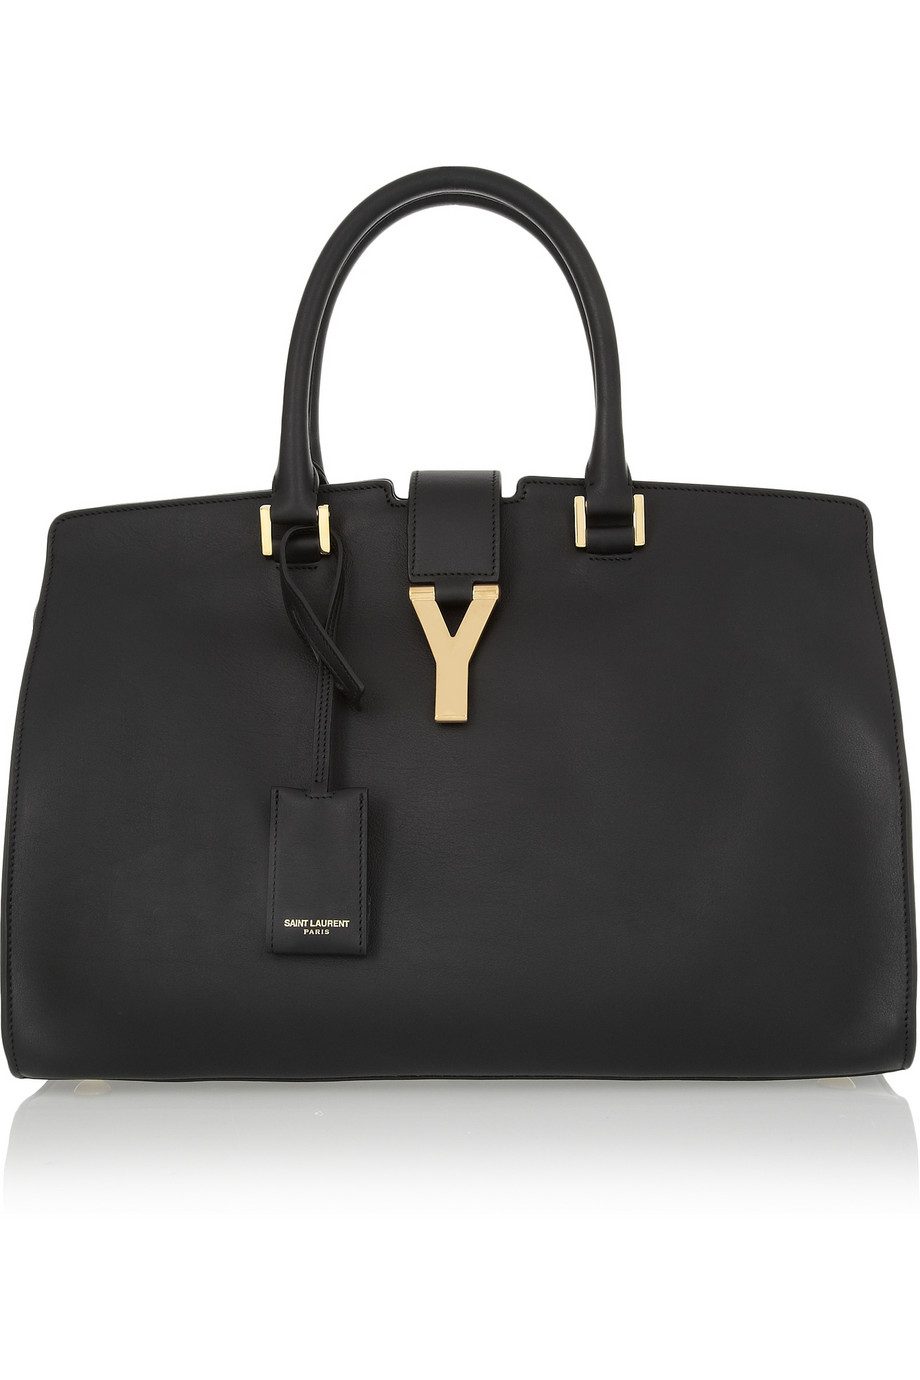 saint laurent cabas chyc medium leather shopper in black. Black Bedroom Furniture Sets. Home Design Ideas